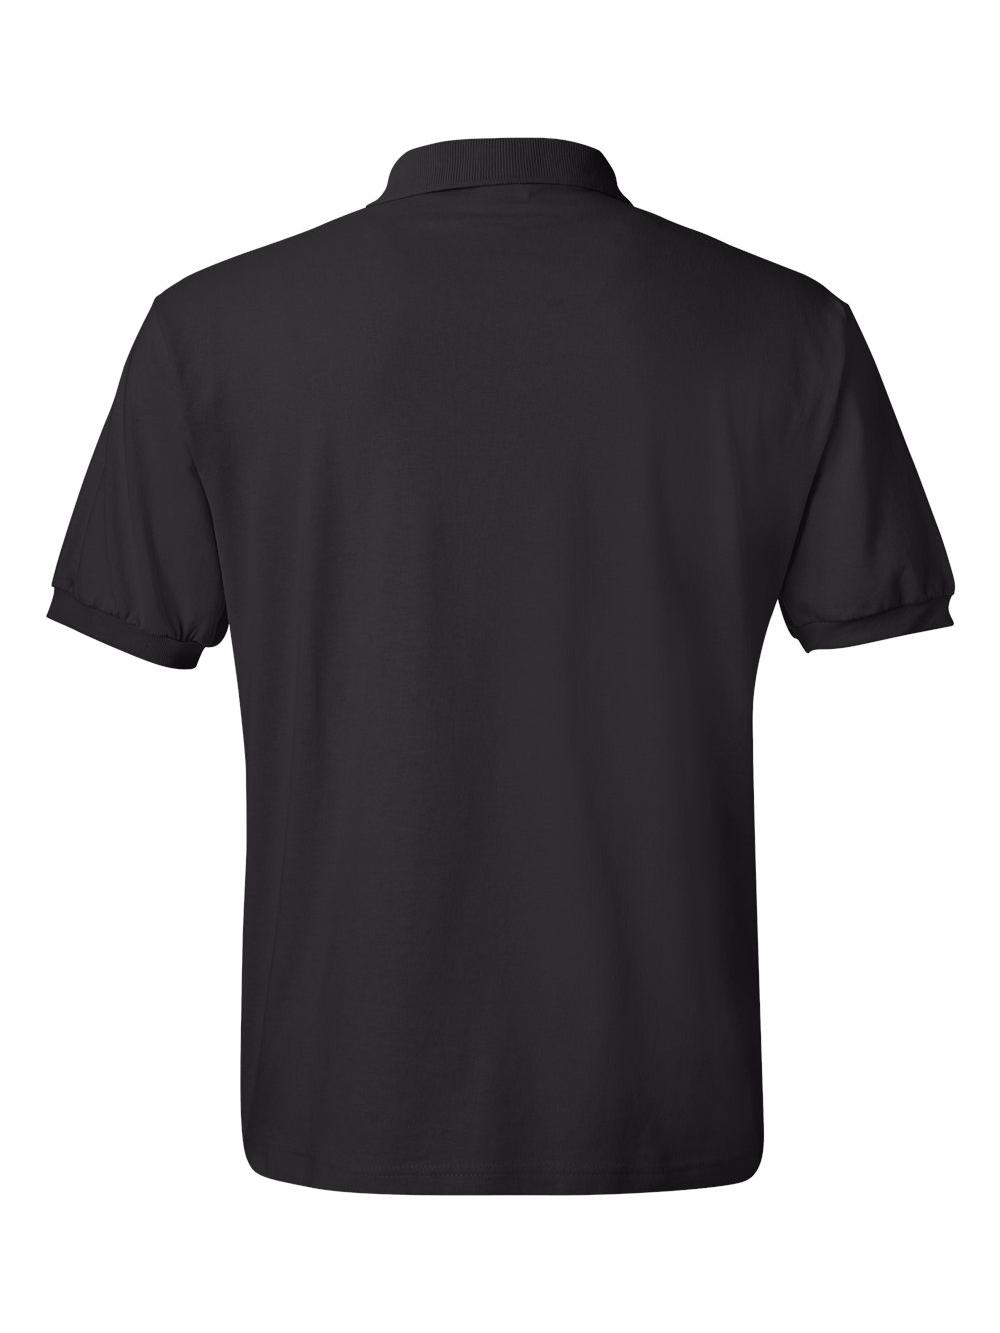 Hanes-Ecosmart-Jersey-Sport-Shirt-054X thumbnail 7